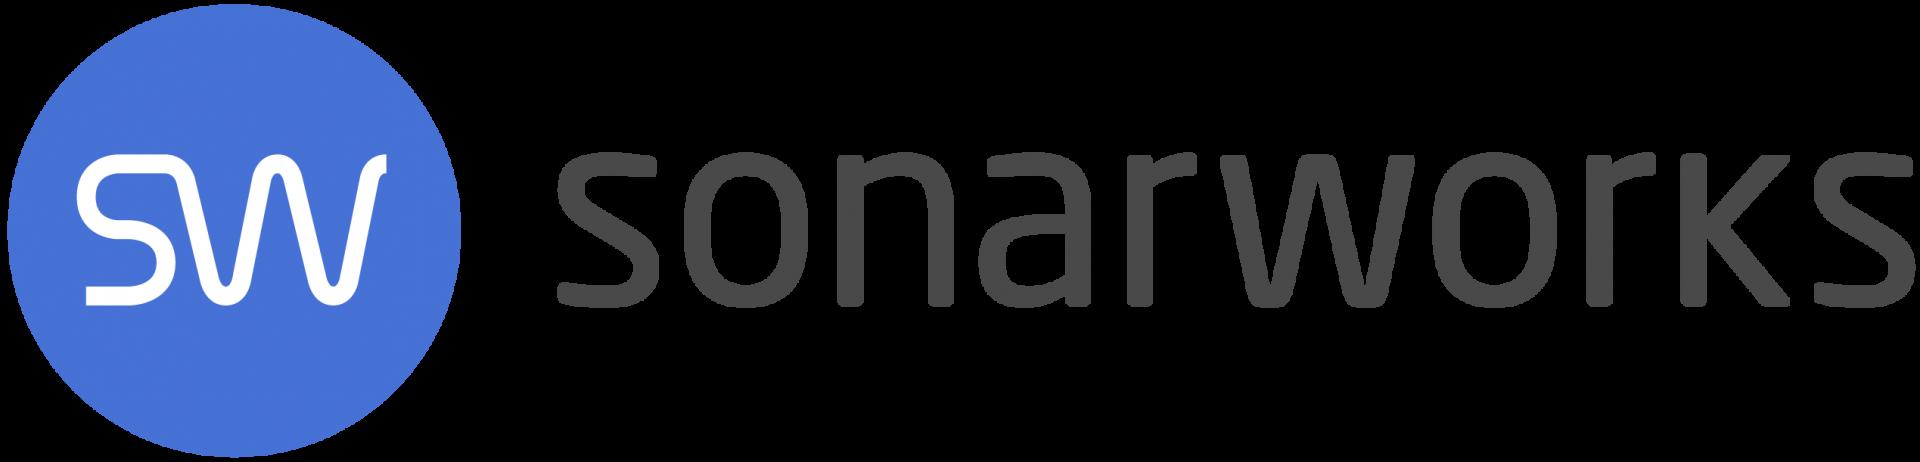 sonoarworks logo